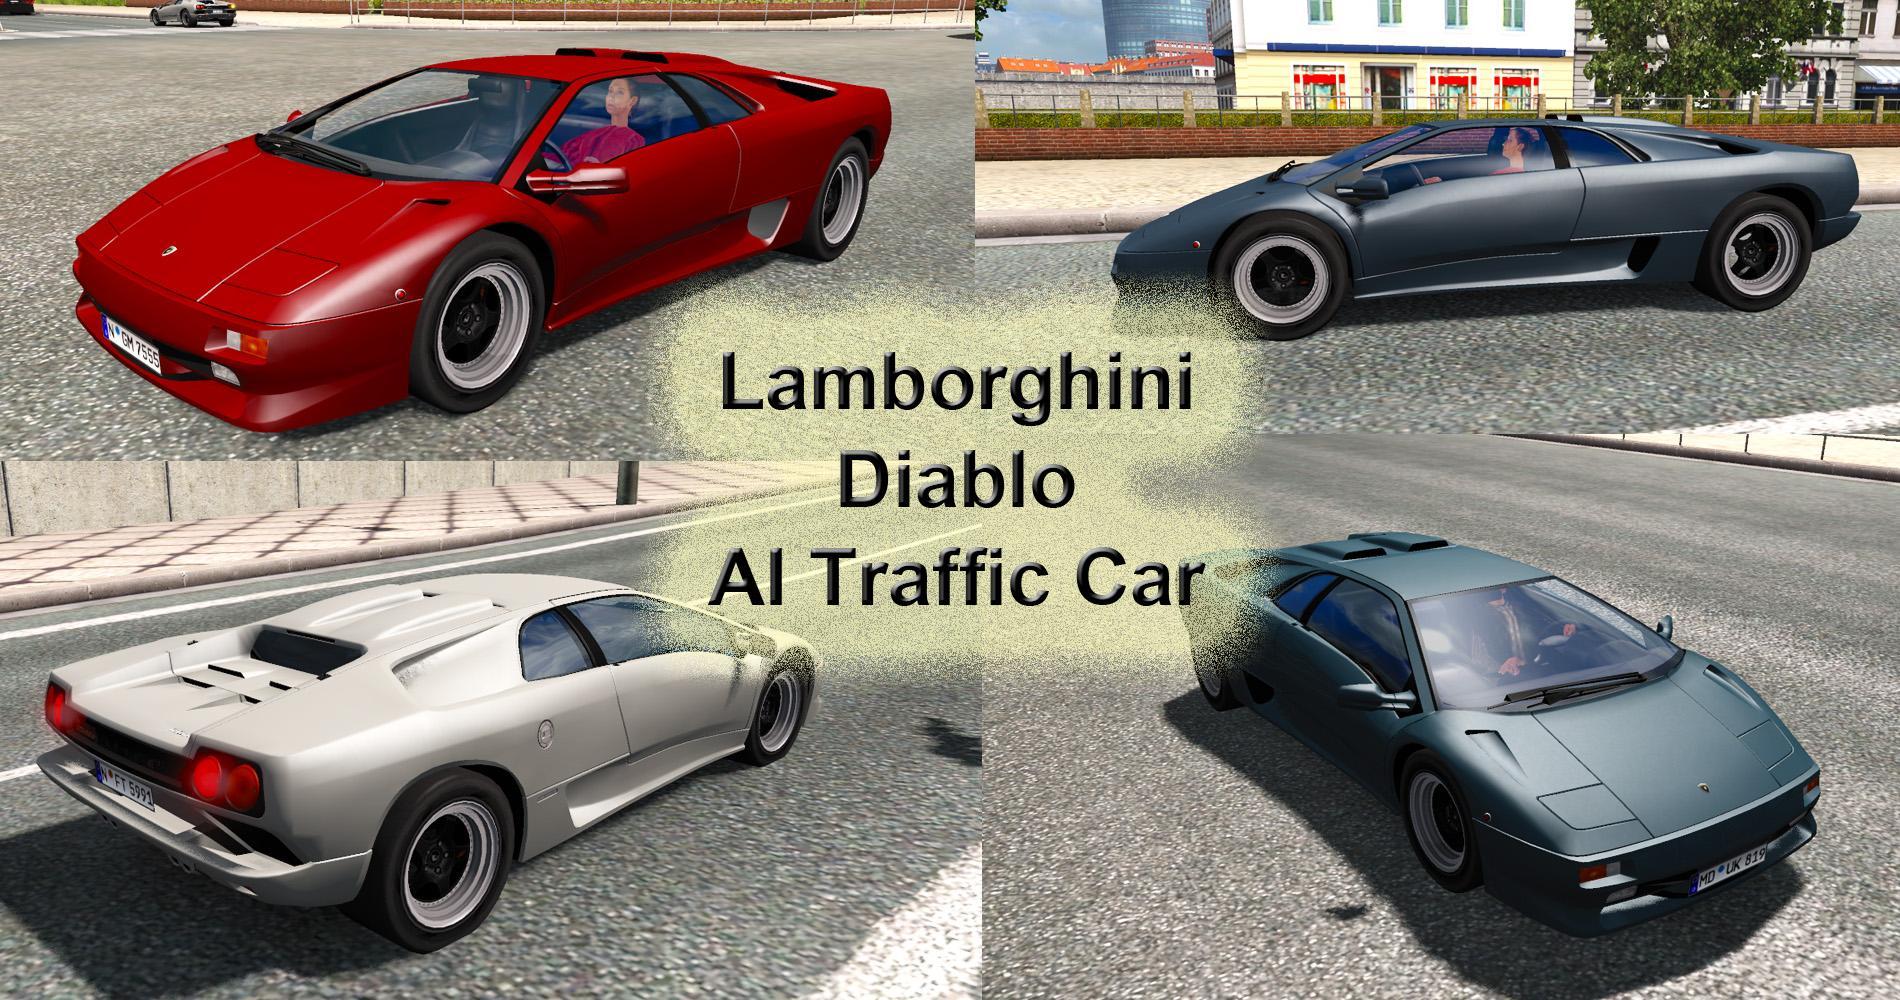 LAMBORGHINI DIABLO AI TRAFFIC CAR ETS 2 -Euro Truck